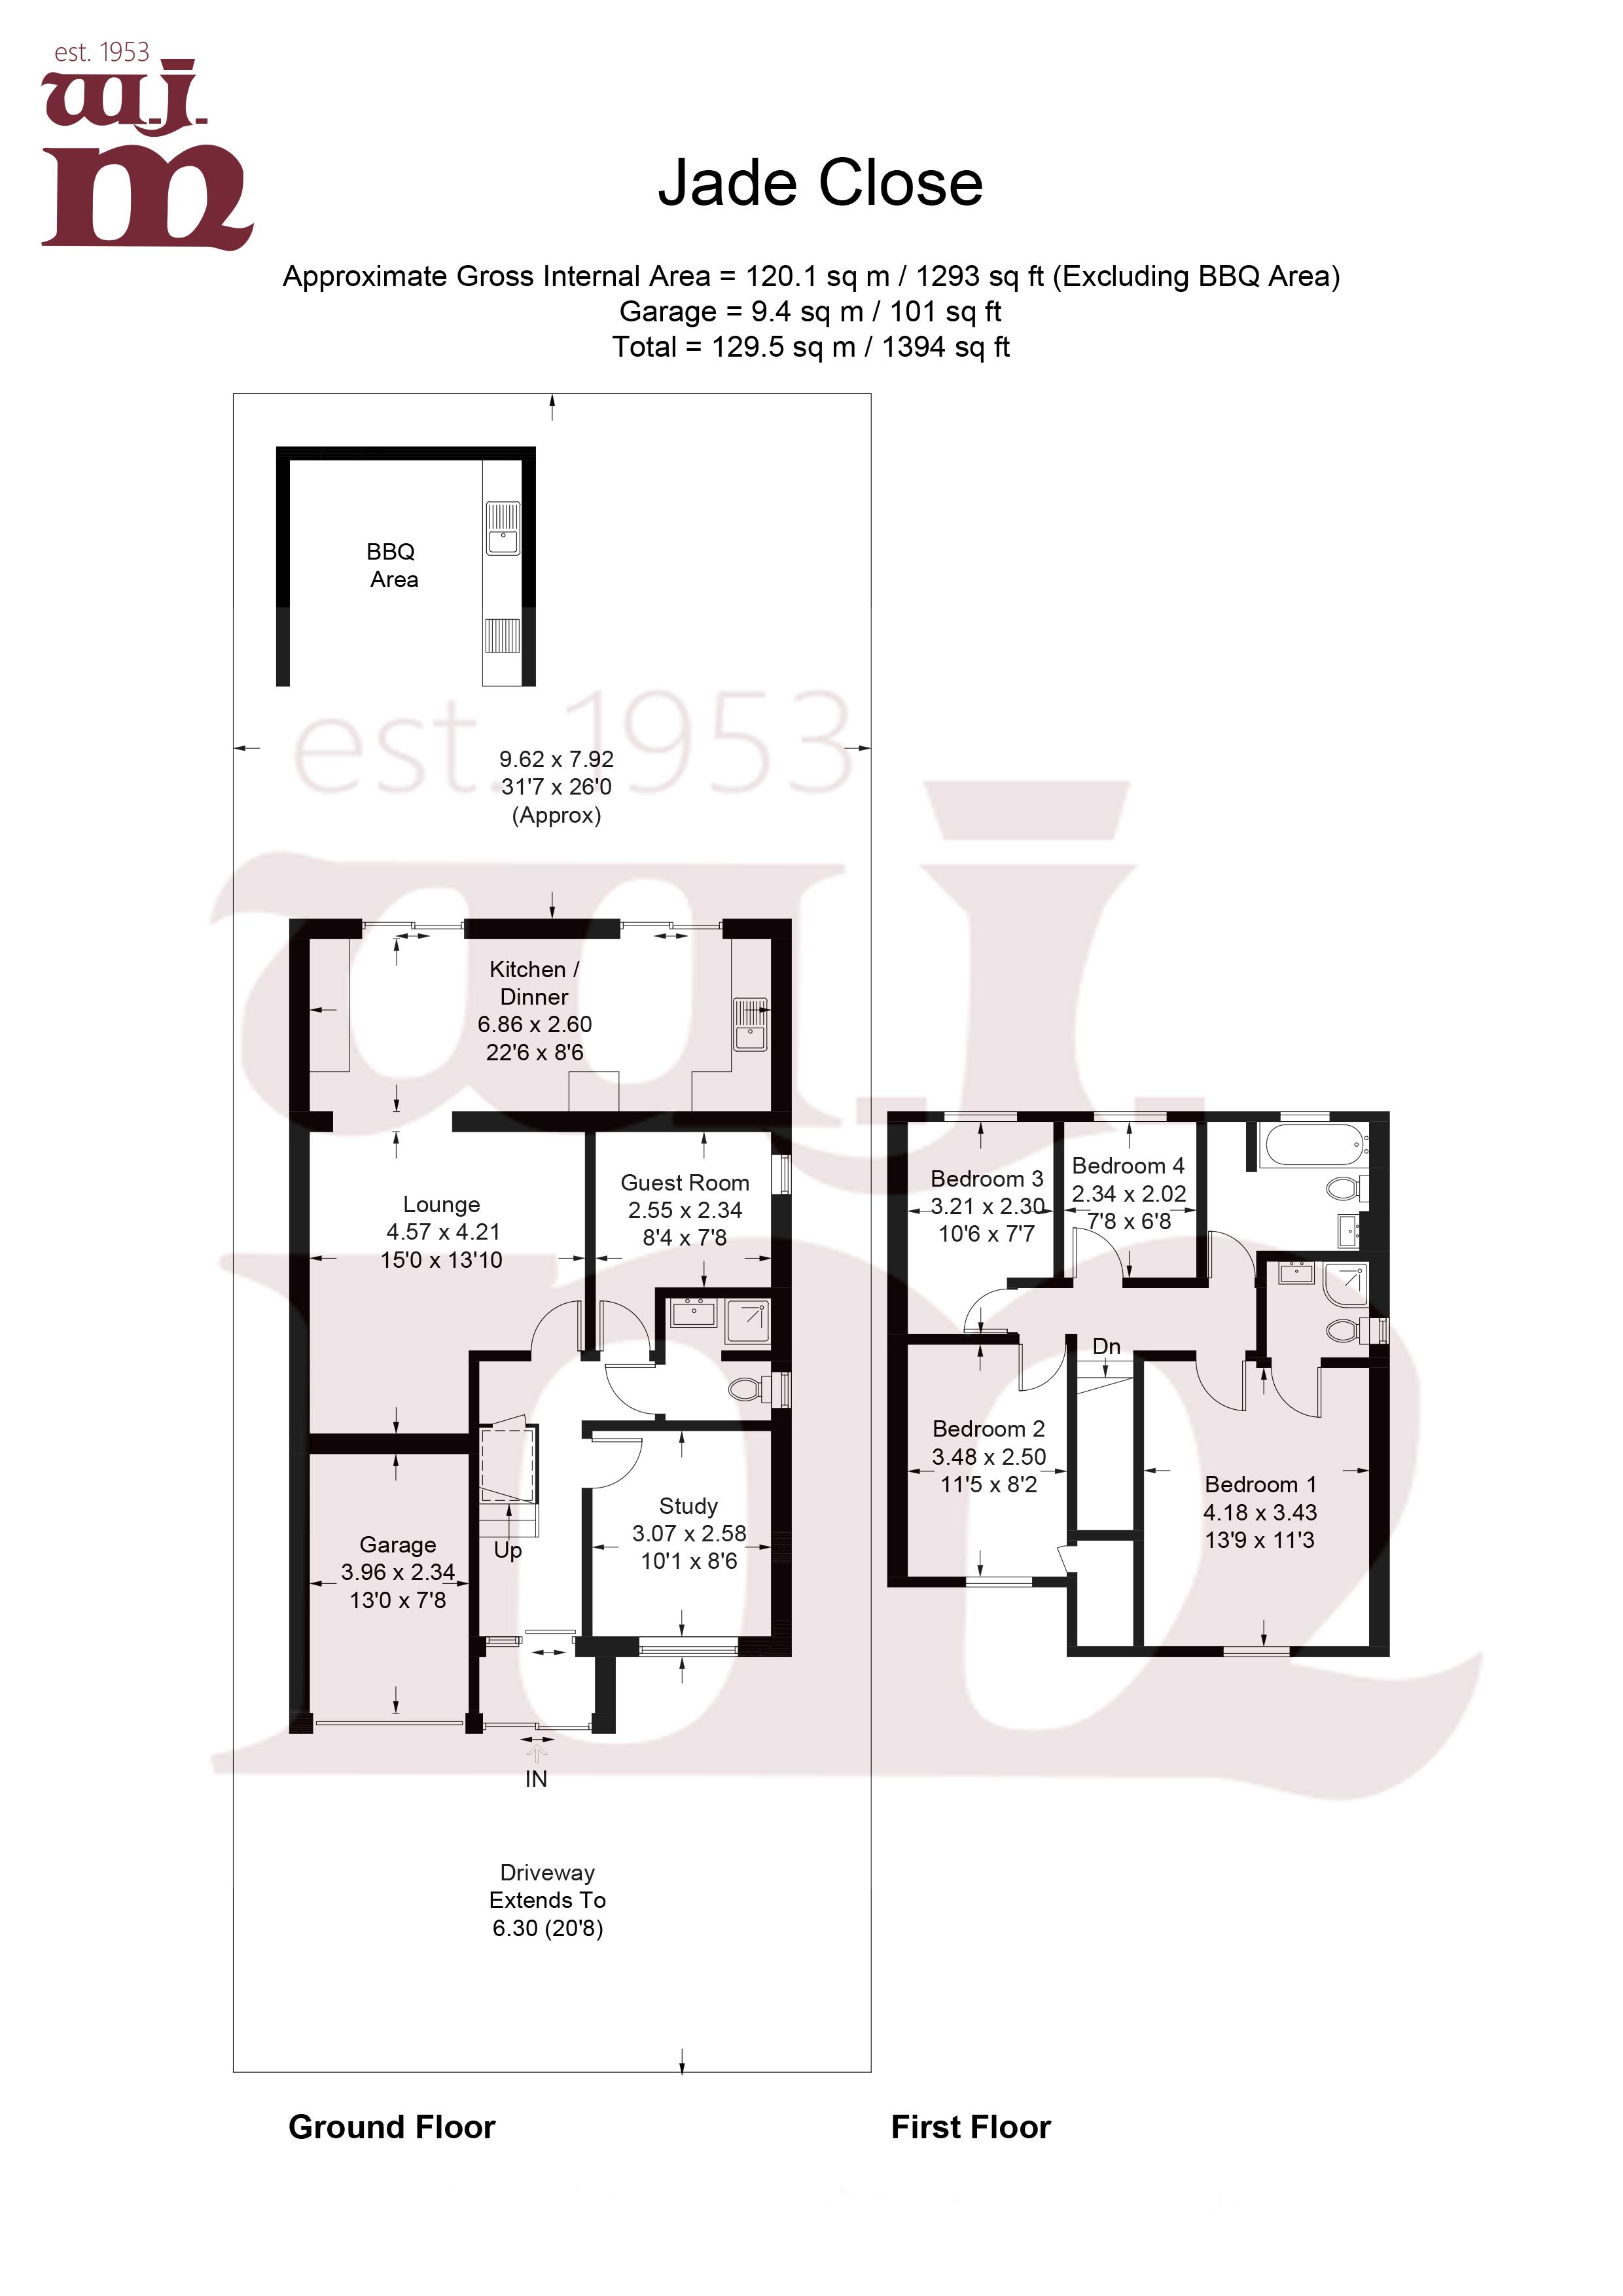 customer_1/branch_5/client_40525/sale_property/plan_1563460213.jpeg